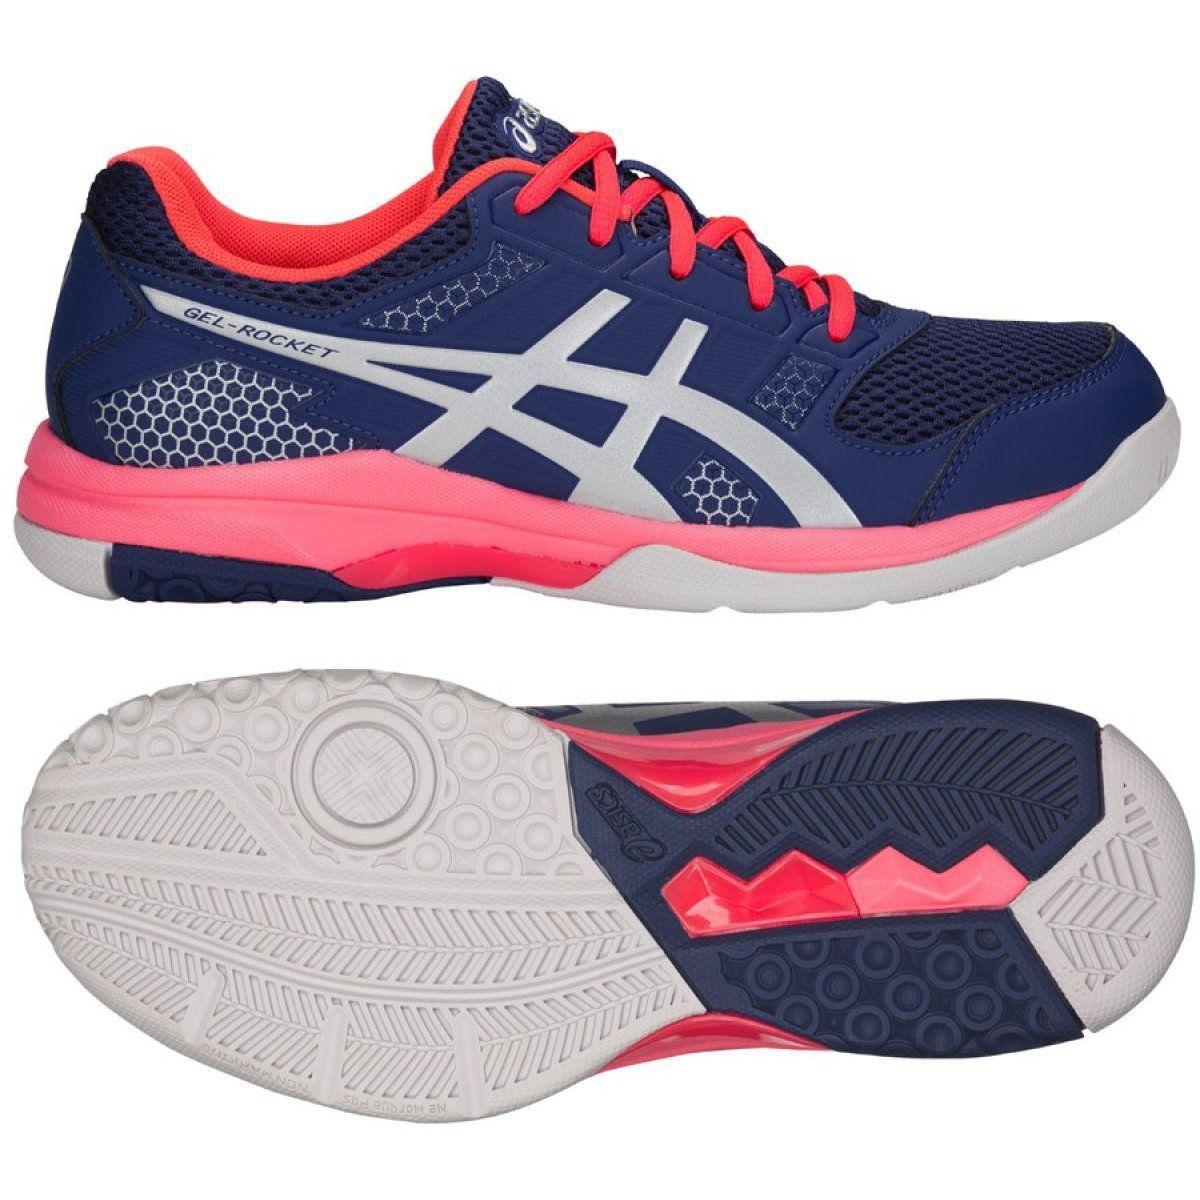 Buty Do Siatkowki Asics Gel Rocket 8 W B756y 400 Granatowe Granatowe Volleyball Shoes Womens Athletic Shoes Asics